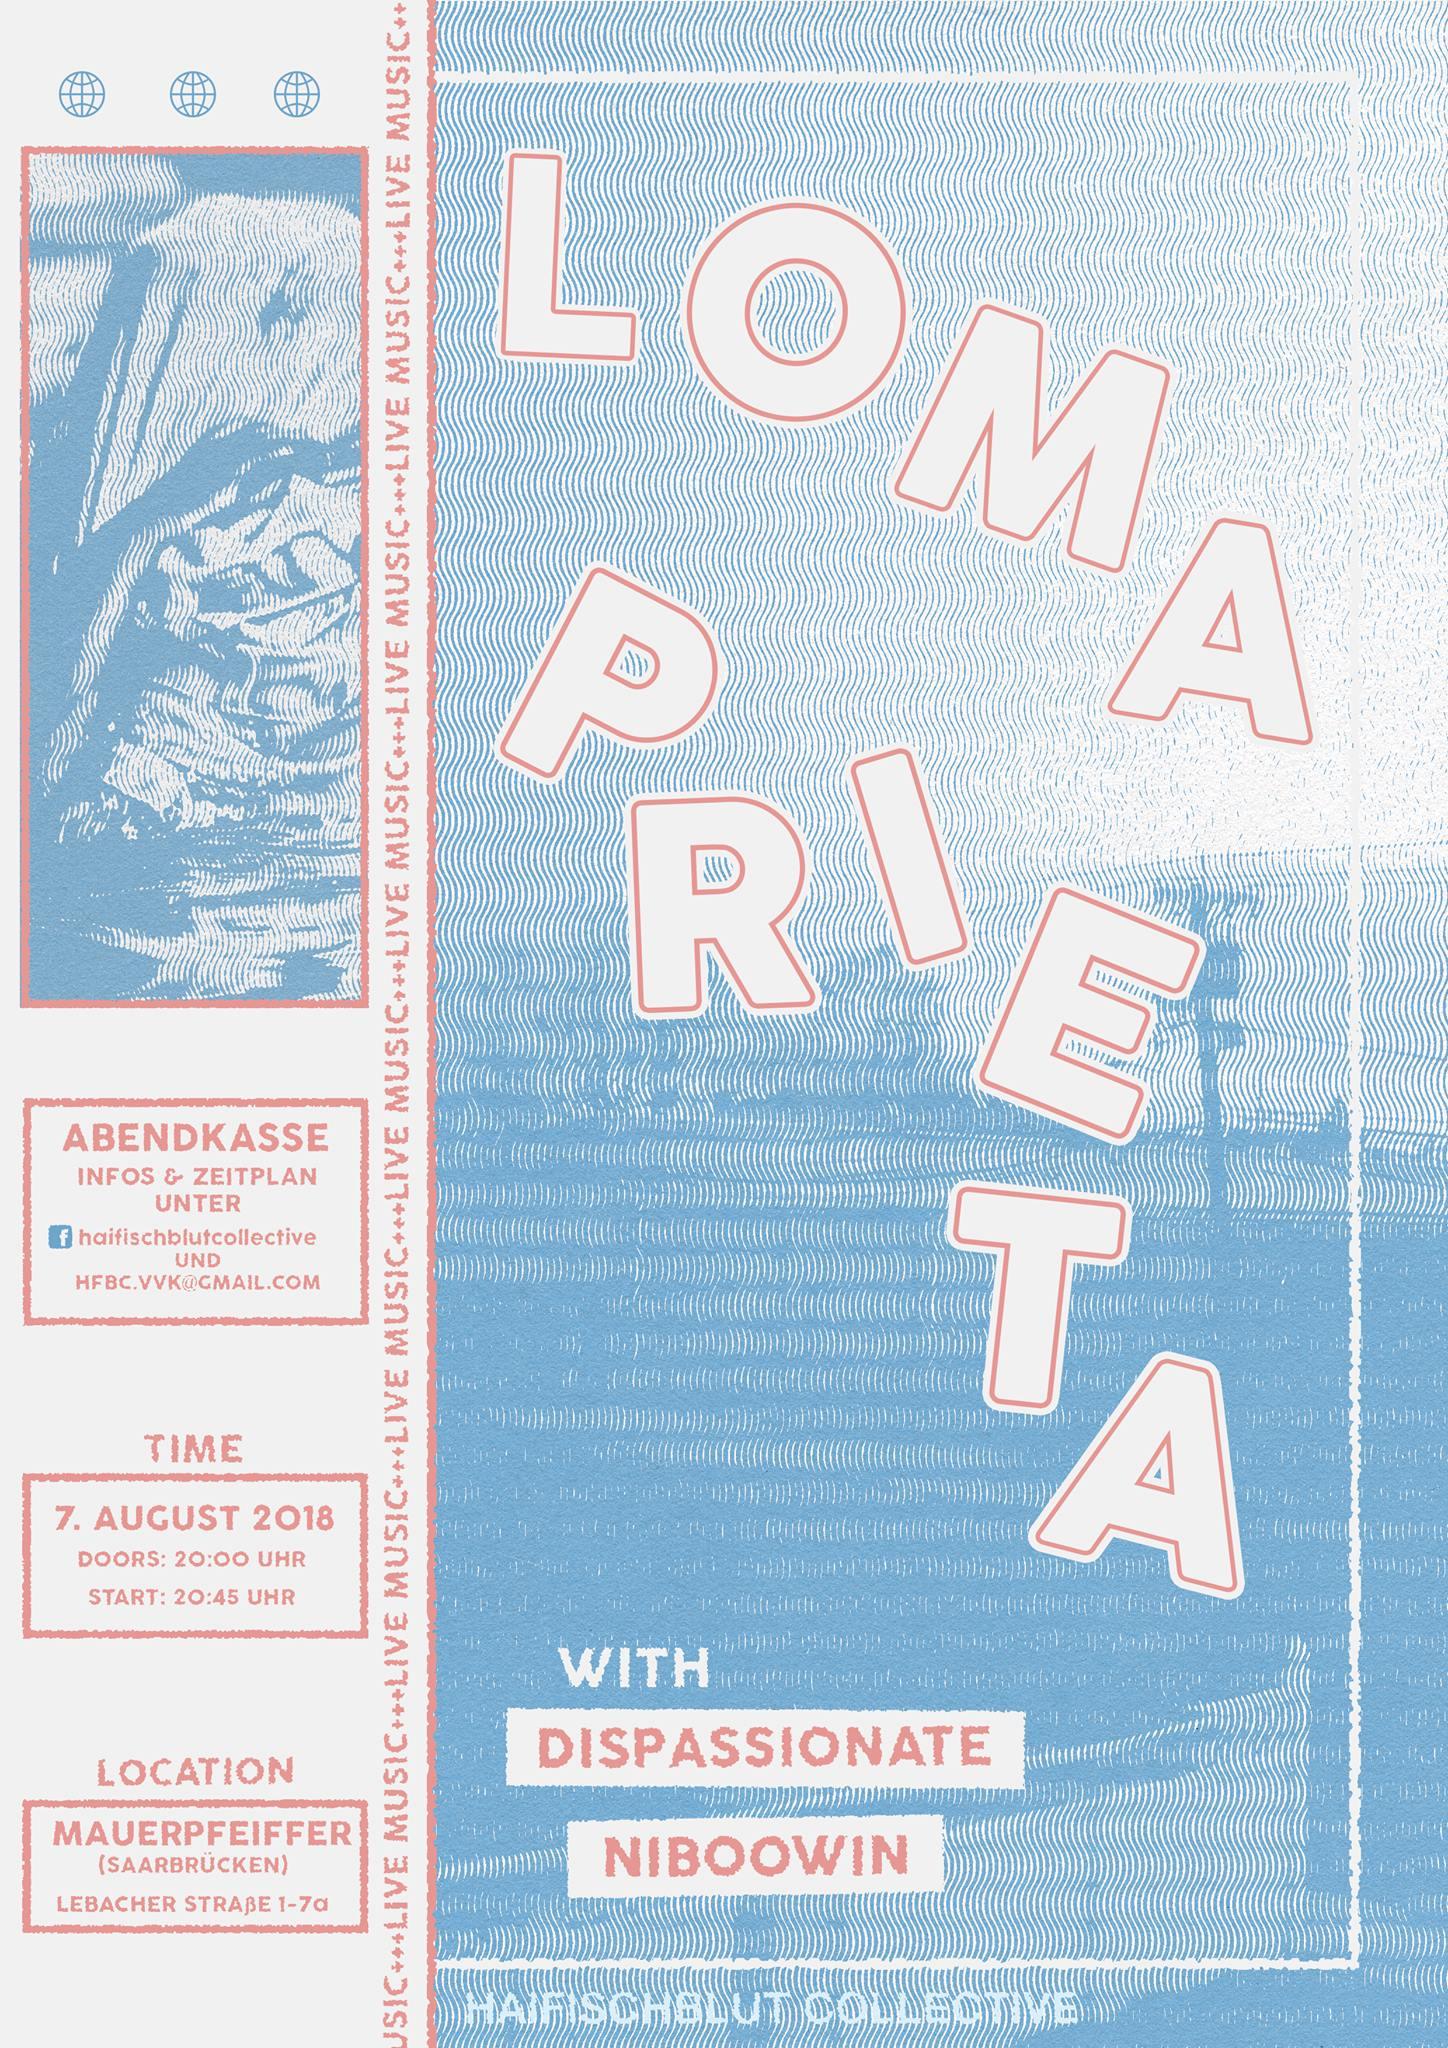 Loma Prieta & Niboowin & Dispassionate